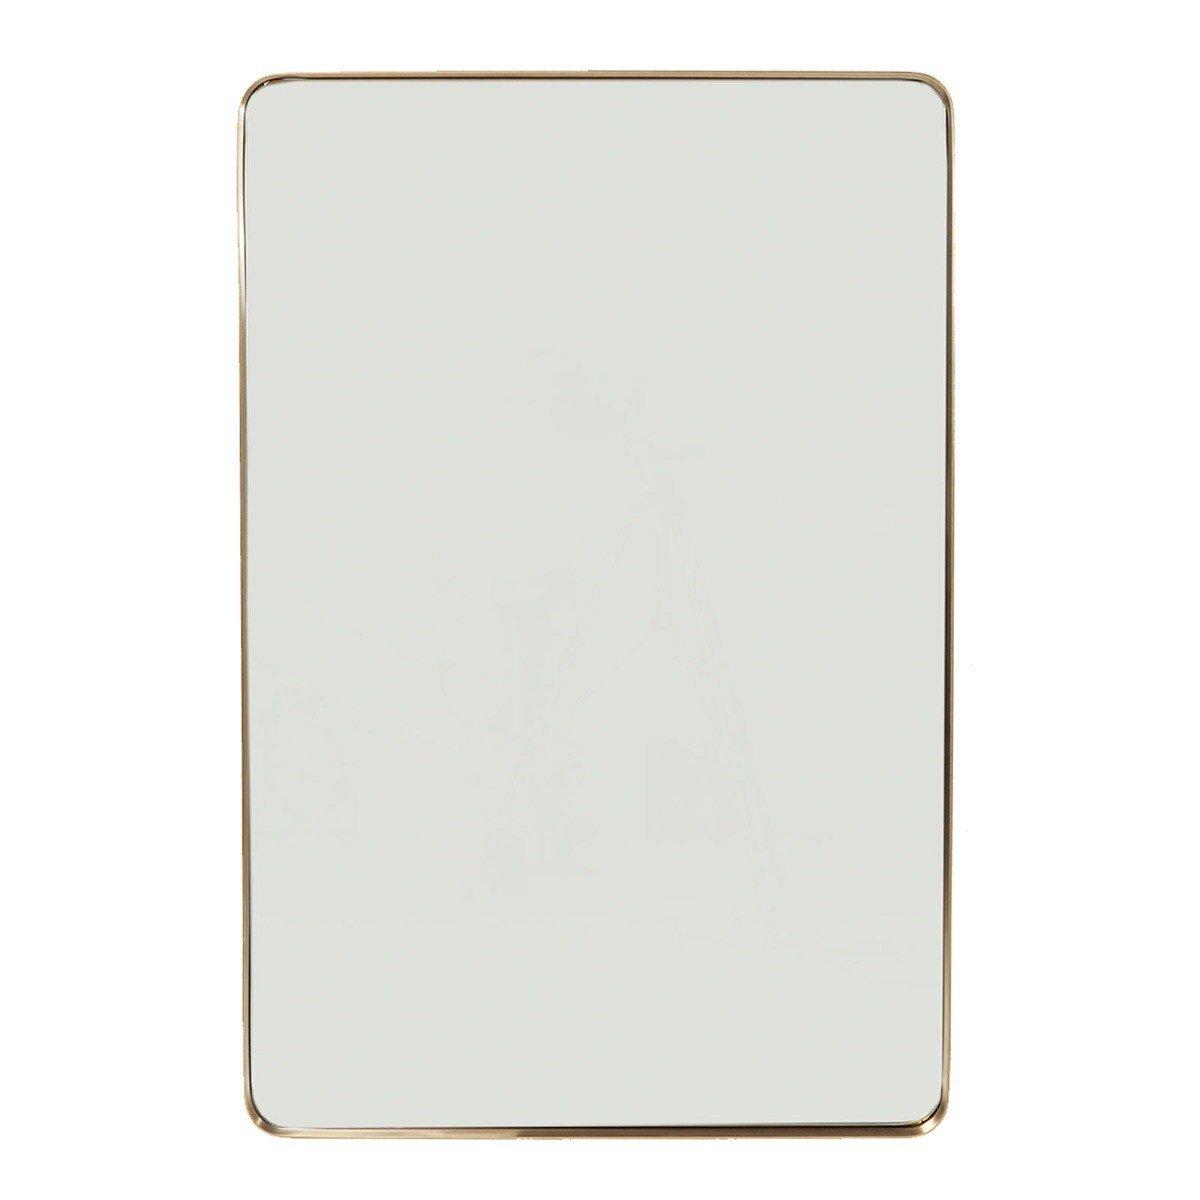 Kare Design spiegel curve rectangular brass 120 x 80 x 5